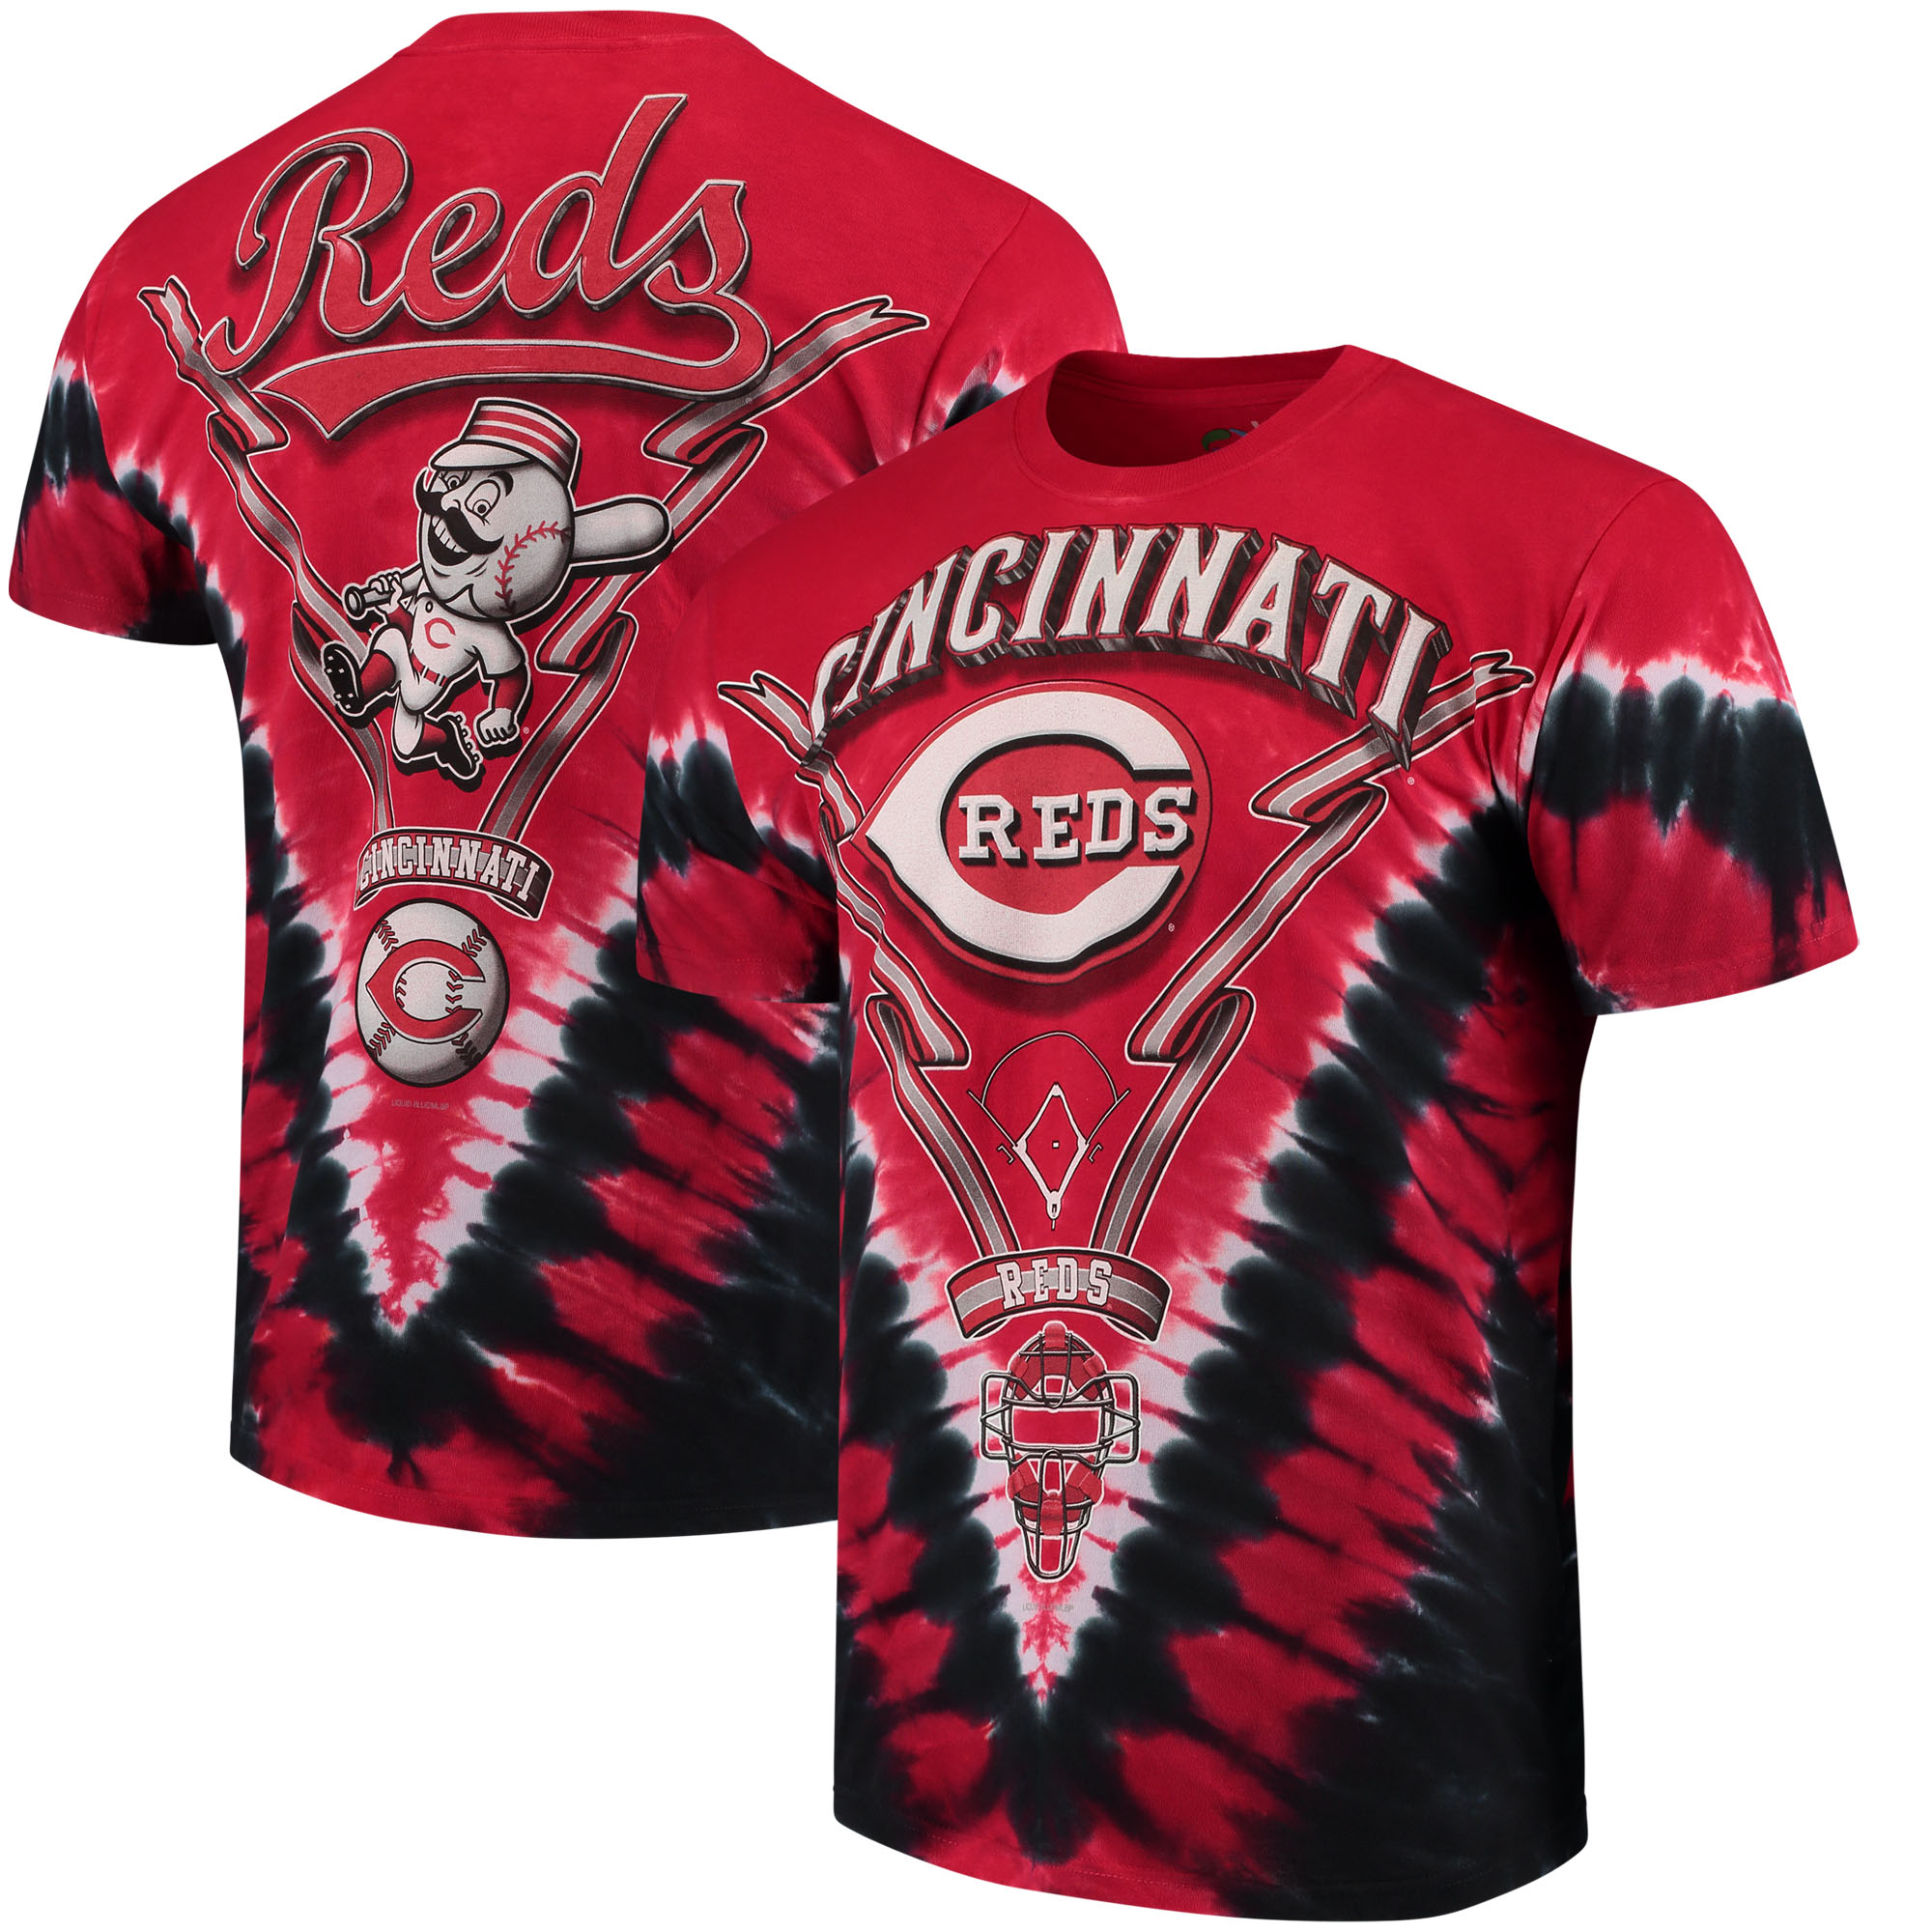 Cincinnati Reds V Tie-Dye T-Shirt - Red/Black